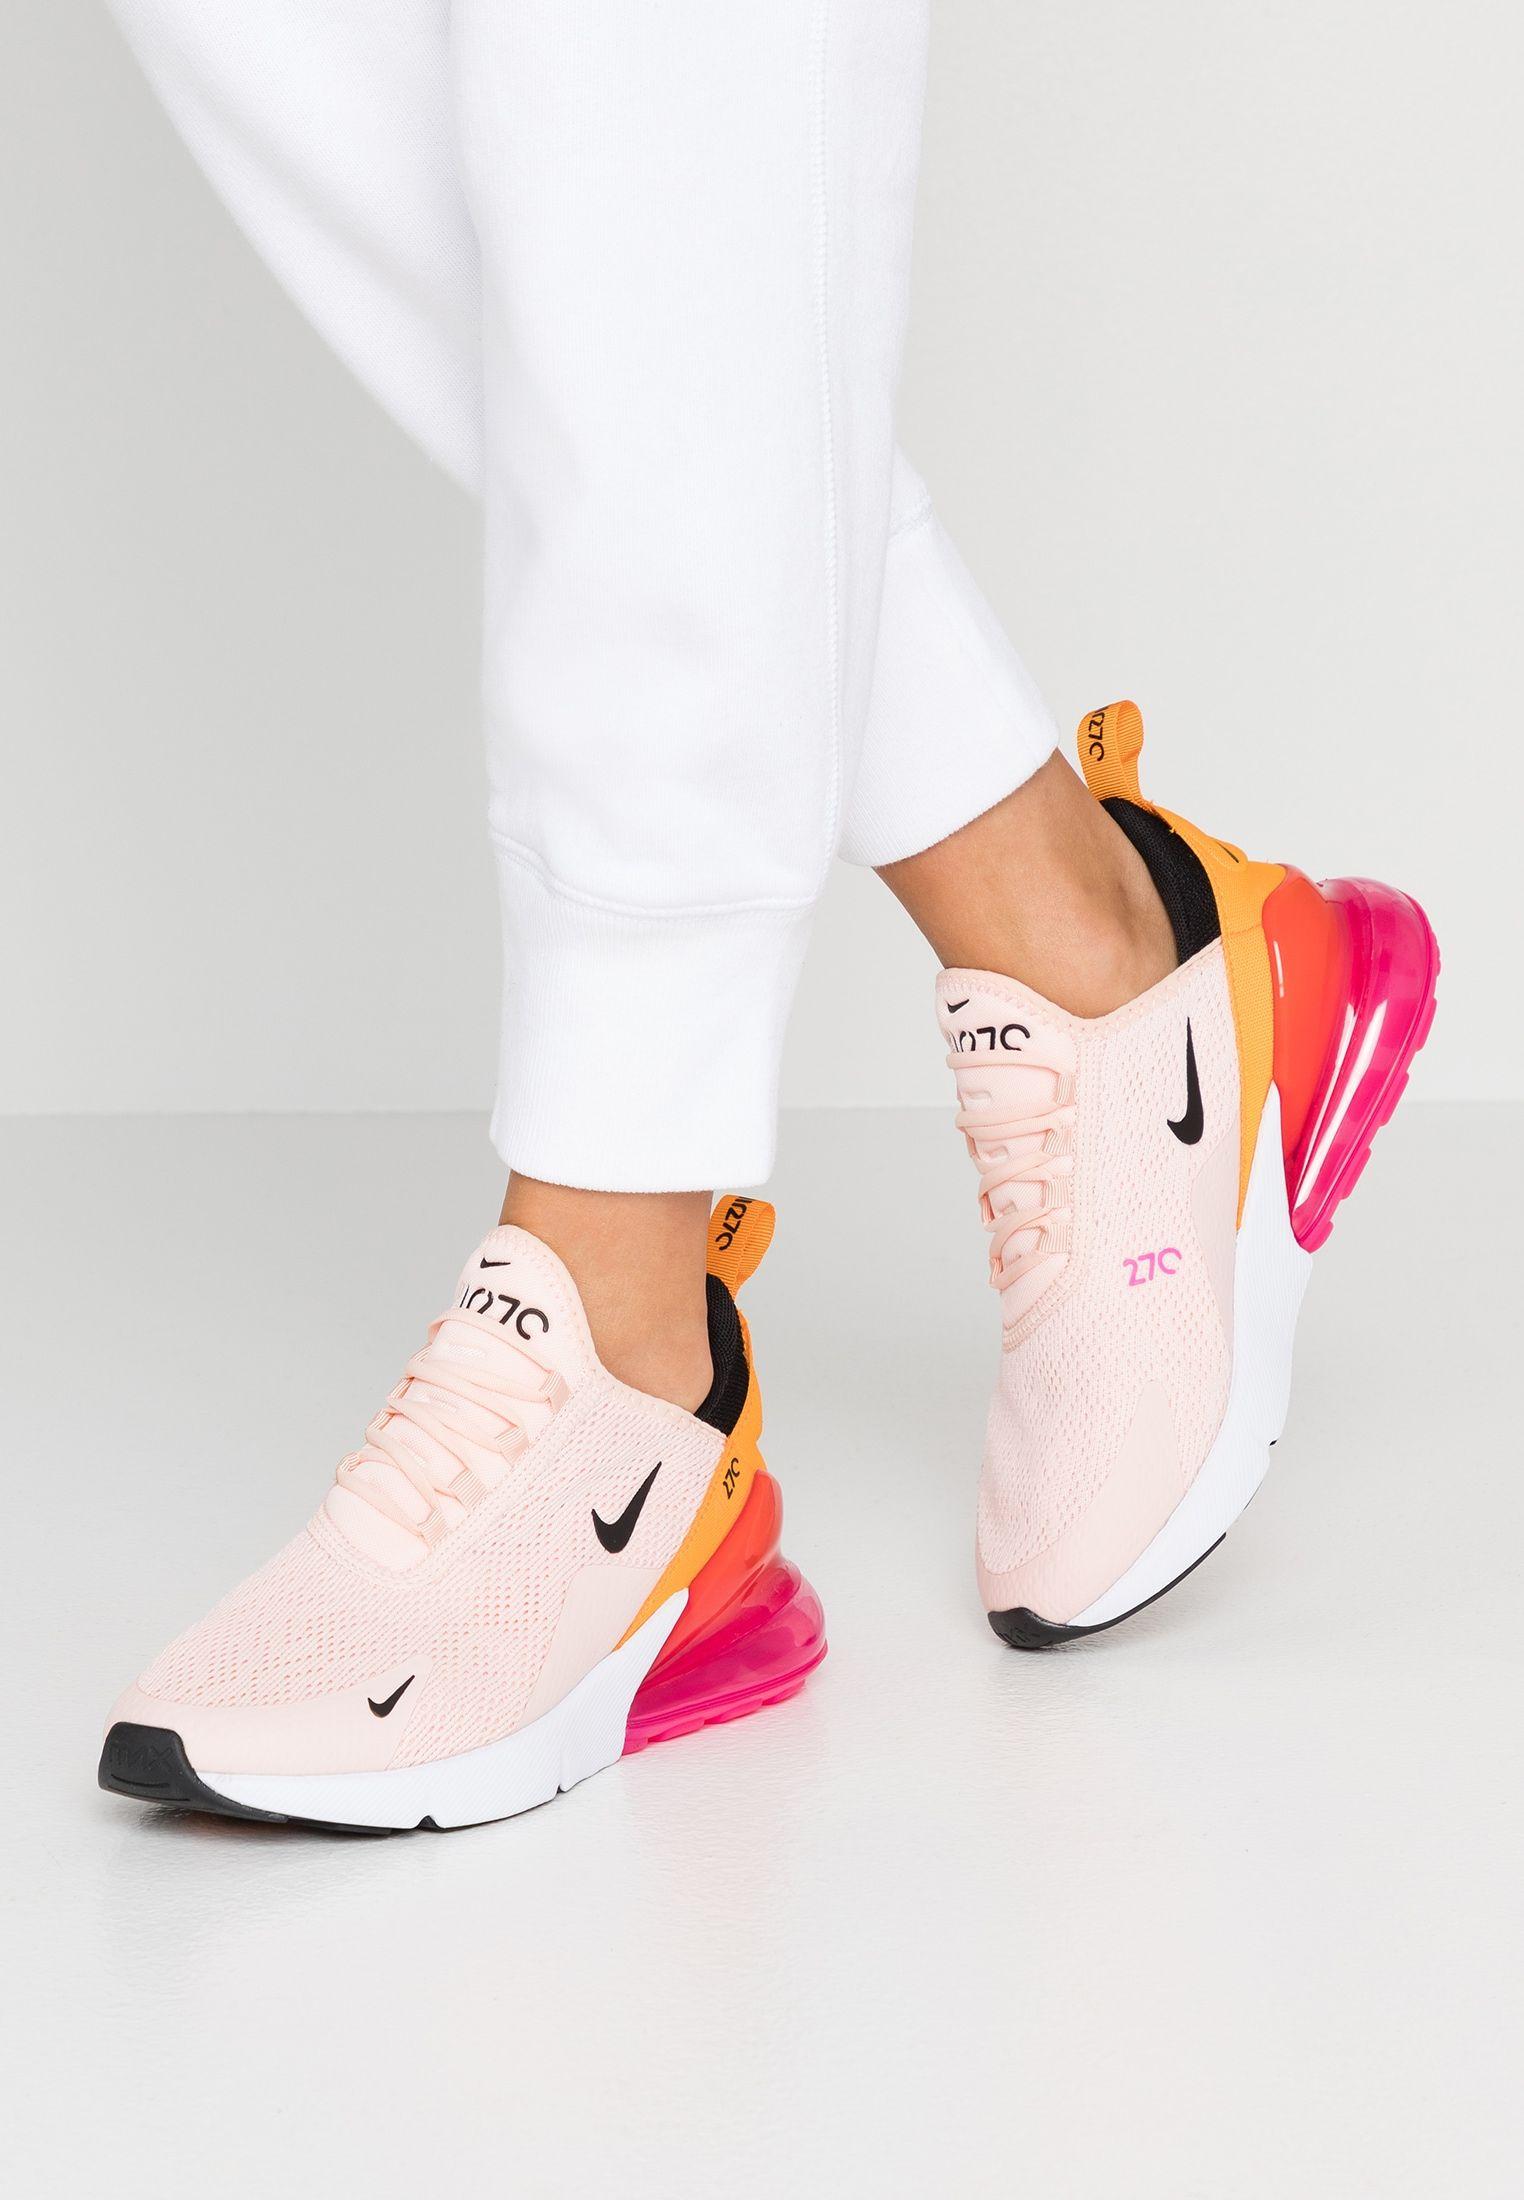 Air Max 270 Sneaker Low Washed Coral Black Laser Fuchsia Orange Peel Zalando At Nike Air Schuhe Rosa Nike Schuhe Und Nike Schuhe